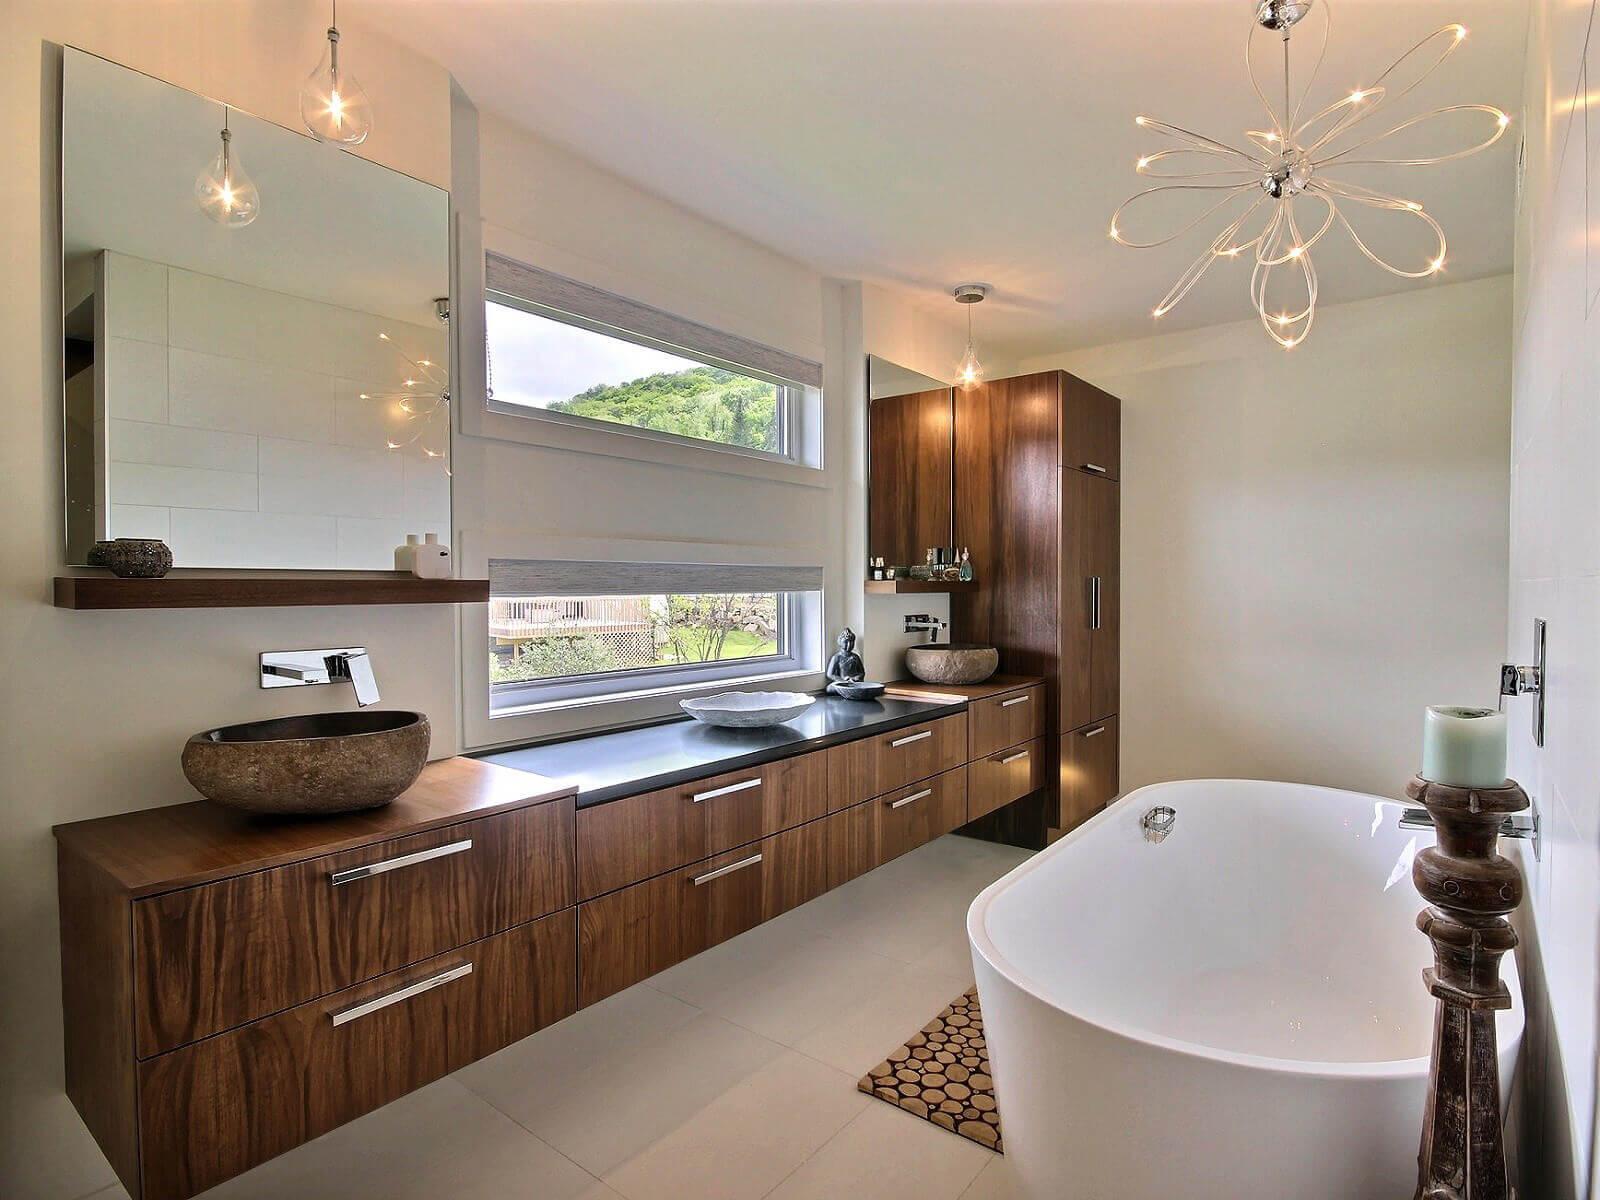 Contemporain cuisines bernier - Radio de salle de bain design ...